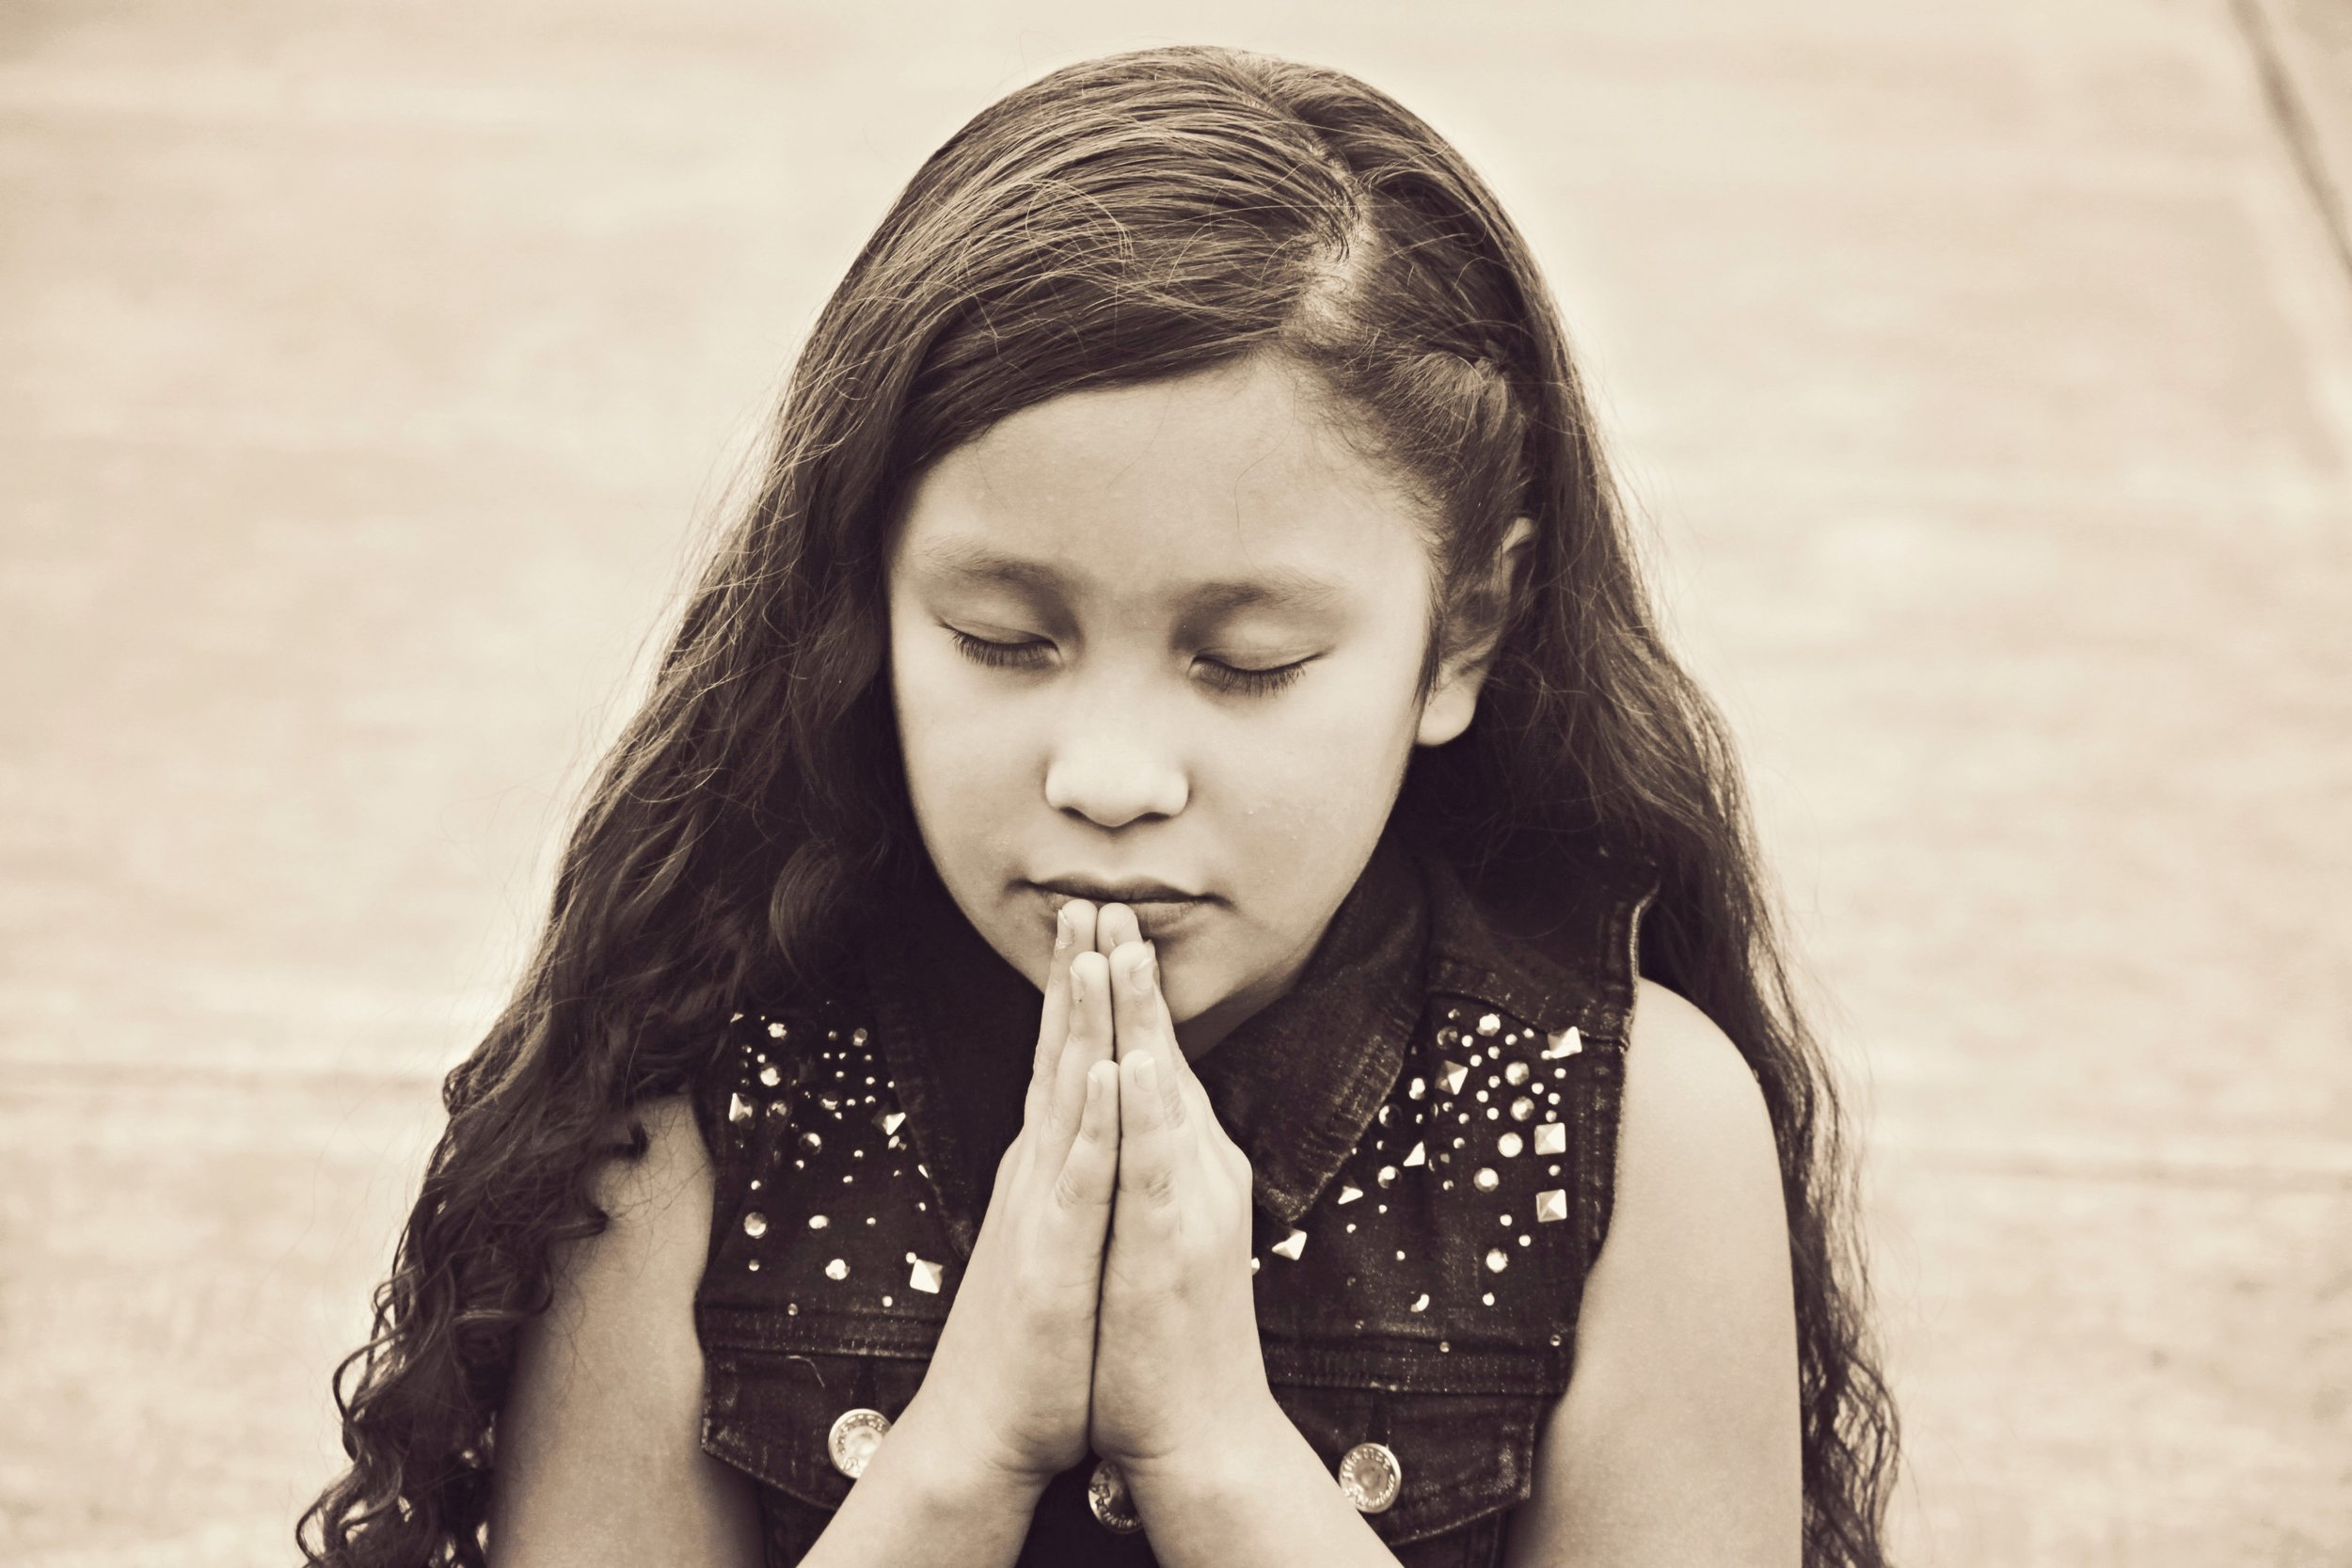 Praying Child Christian Stock Photo.jpg